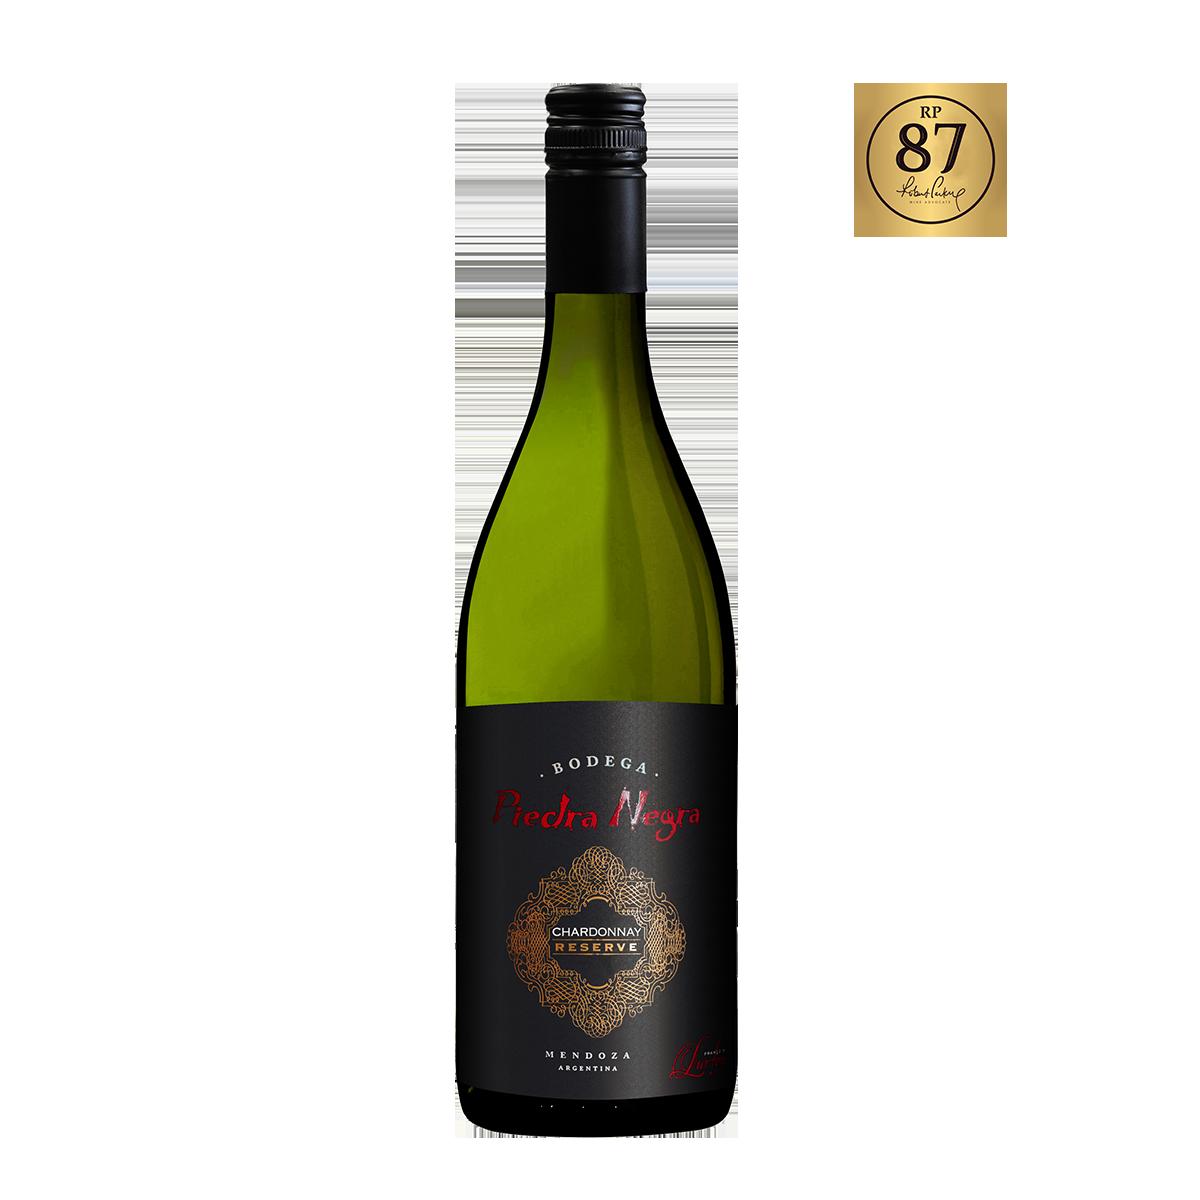 ARL2102 阿根廷門多薩魯頓黑寶石莊園2013夏多內陳年白葡萄酒 Bodega Piedra Negra Chardonnay Reserve, Mendoza (750ml)